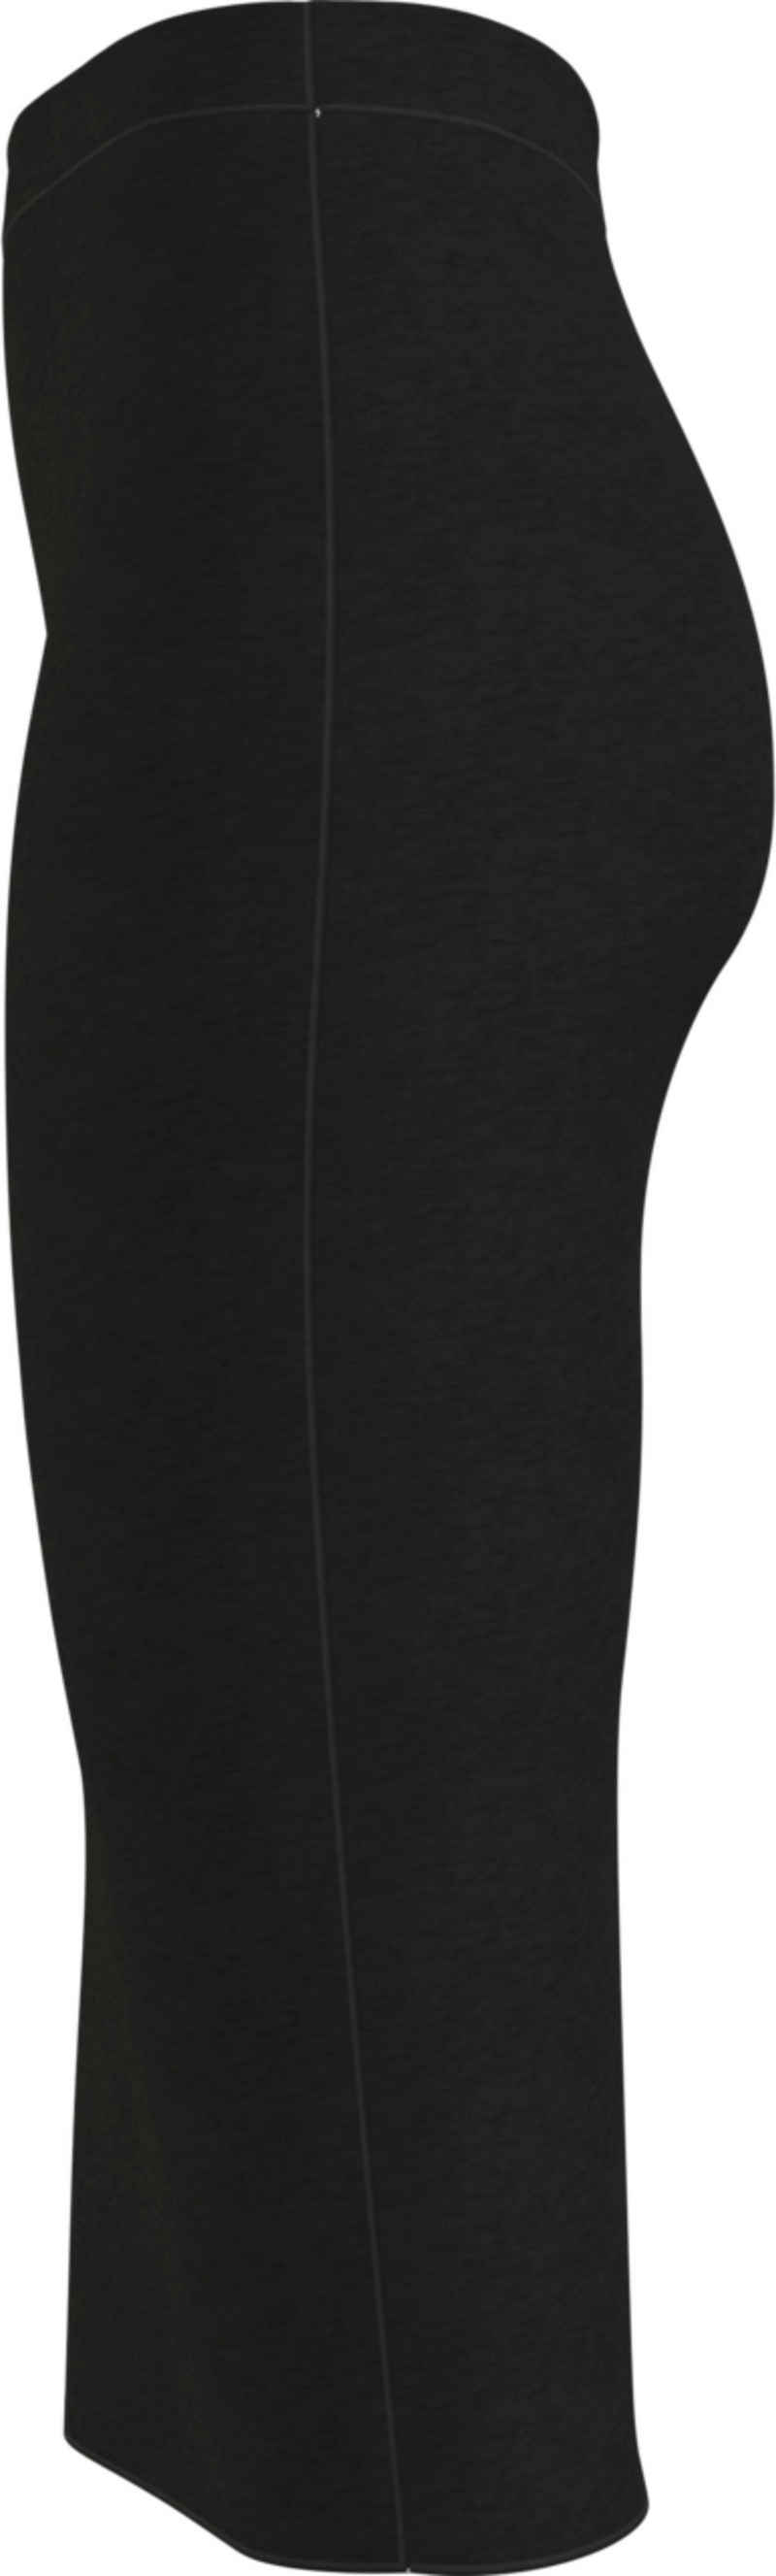 Tommy Jeans Jerseyrock »TJW Bodycon Below-Knee Skirt« mit langem Gehschlitz hinten